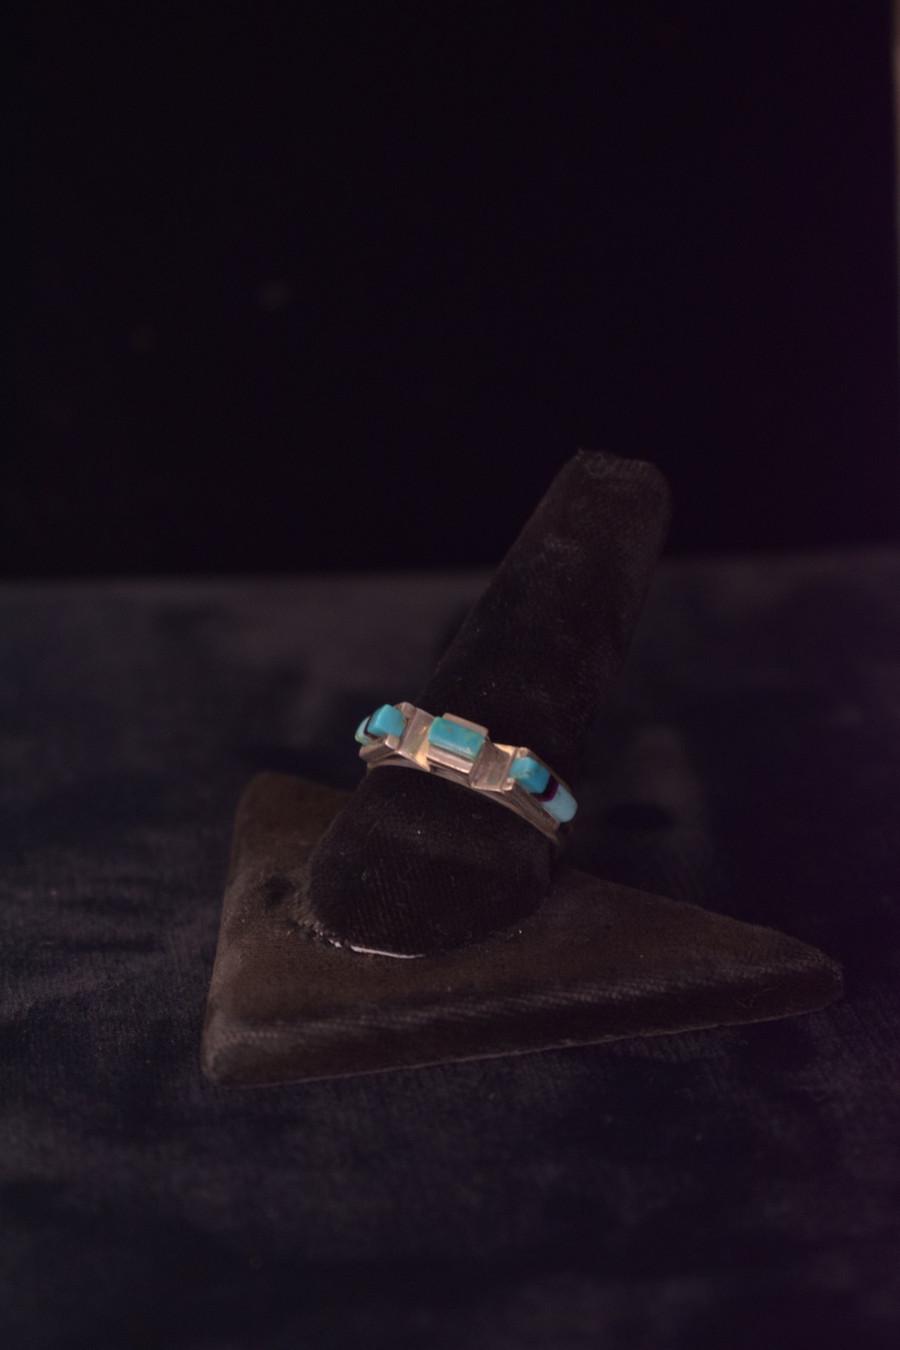 Cubic Zirconia & Turquoise Ring